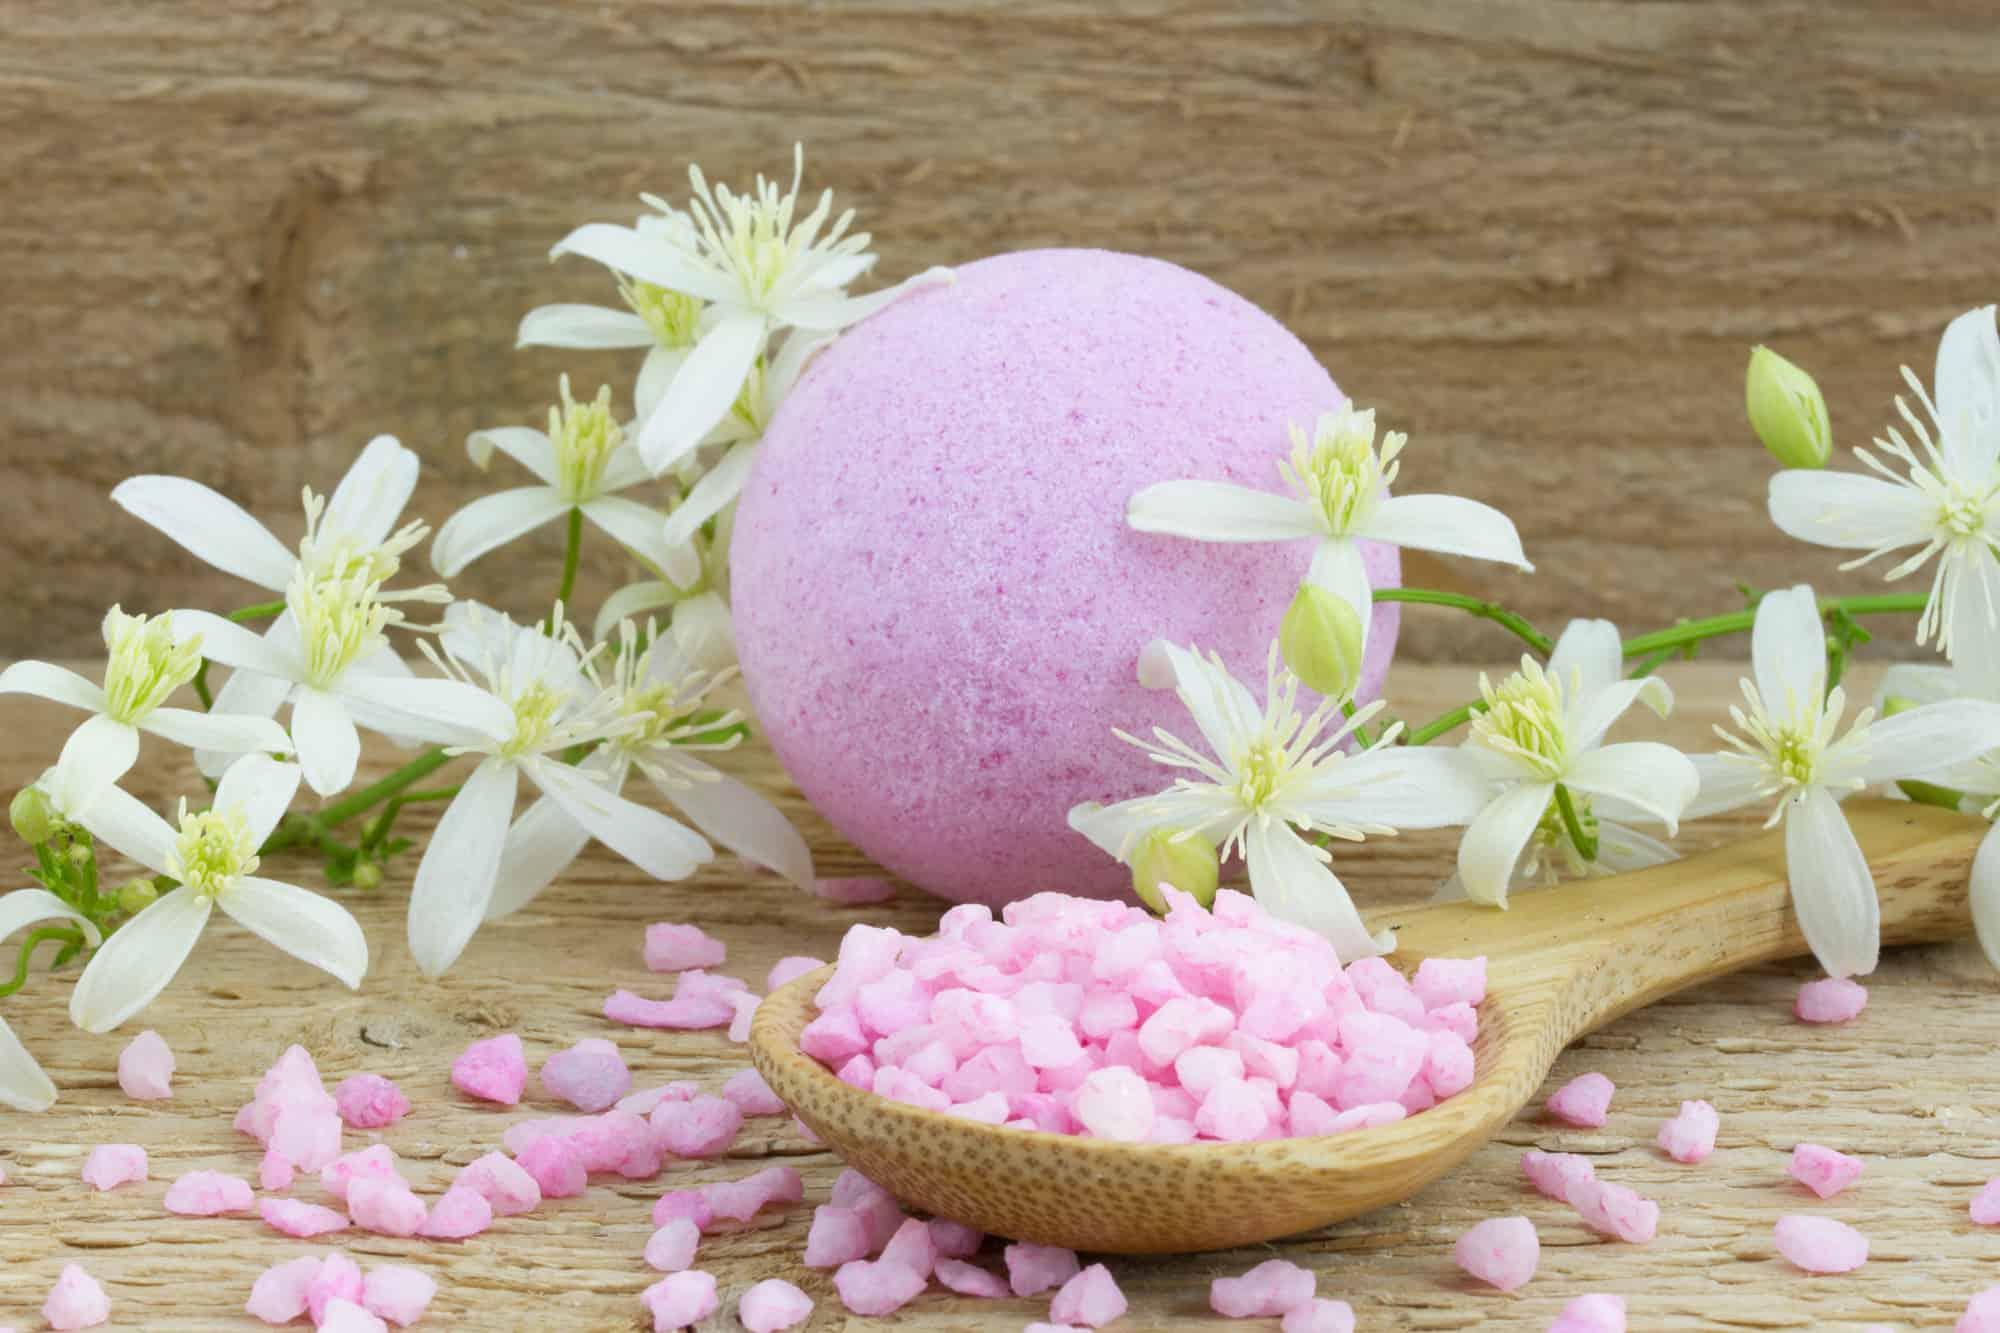 pink bath bomb and bath salt on a spoon